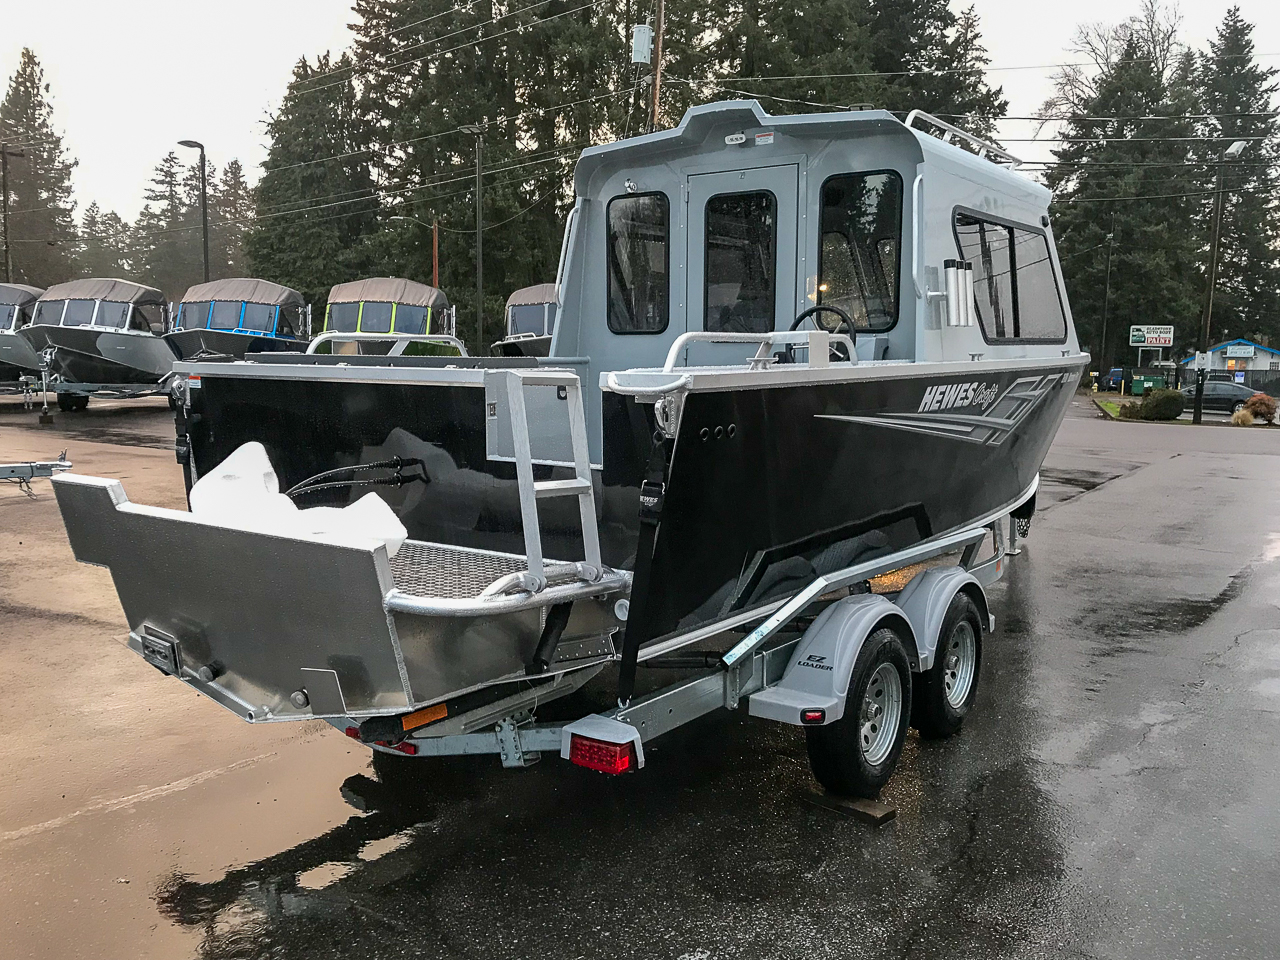 Hewescraft 220 Ocean Pro HT - ON ORDER